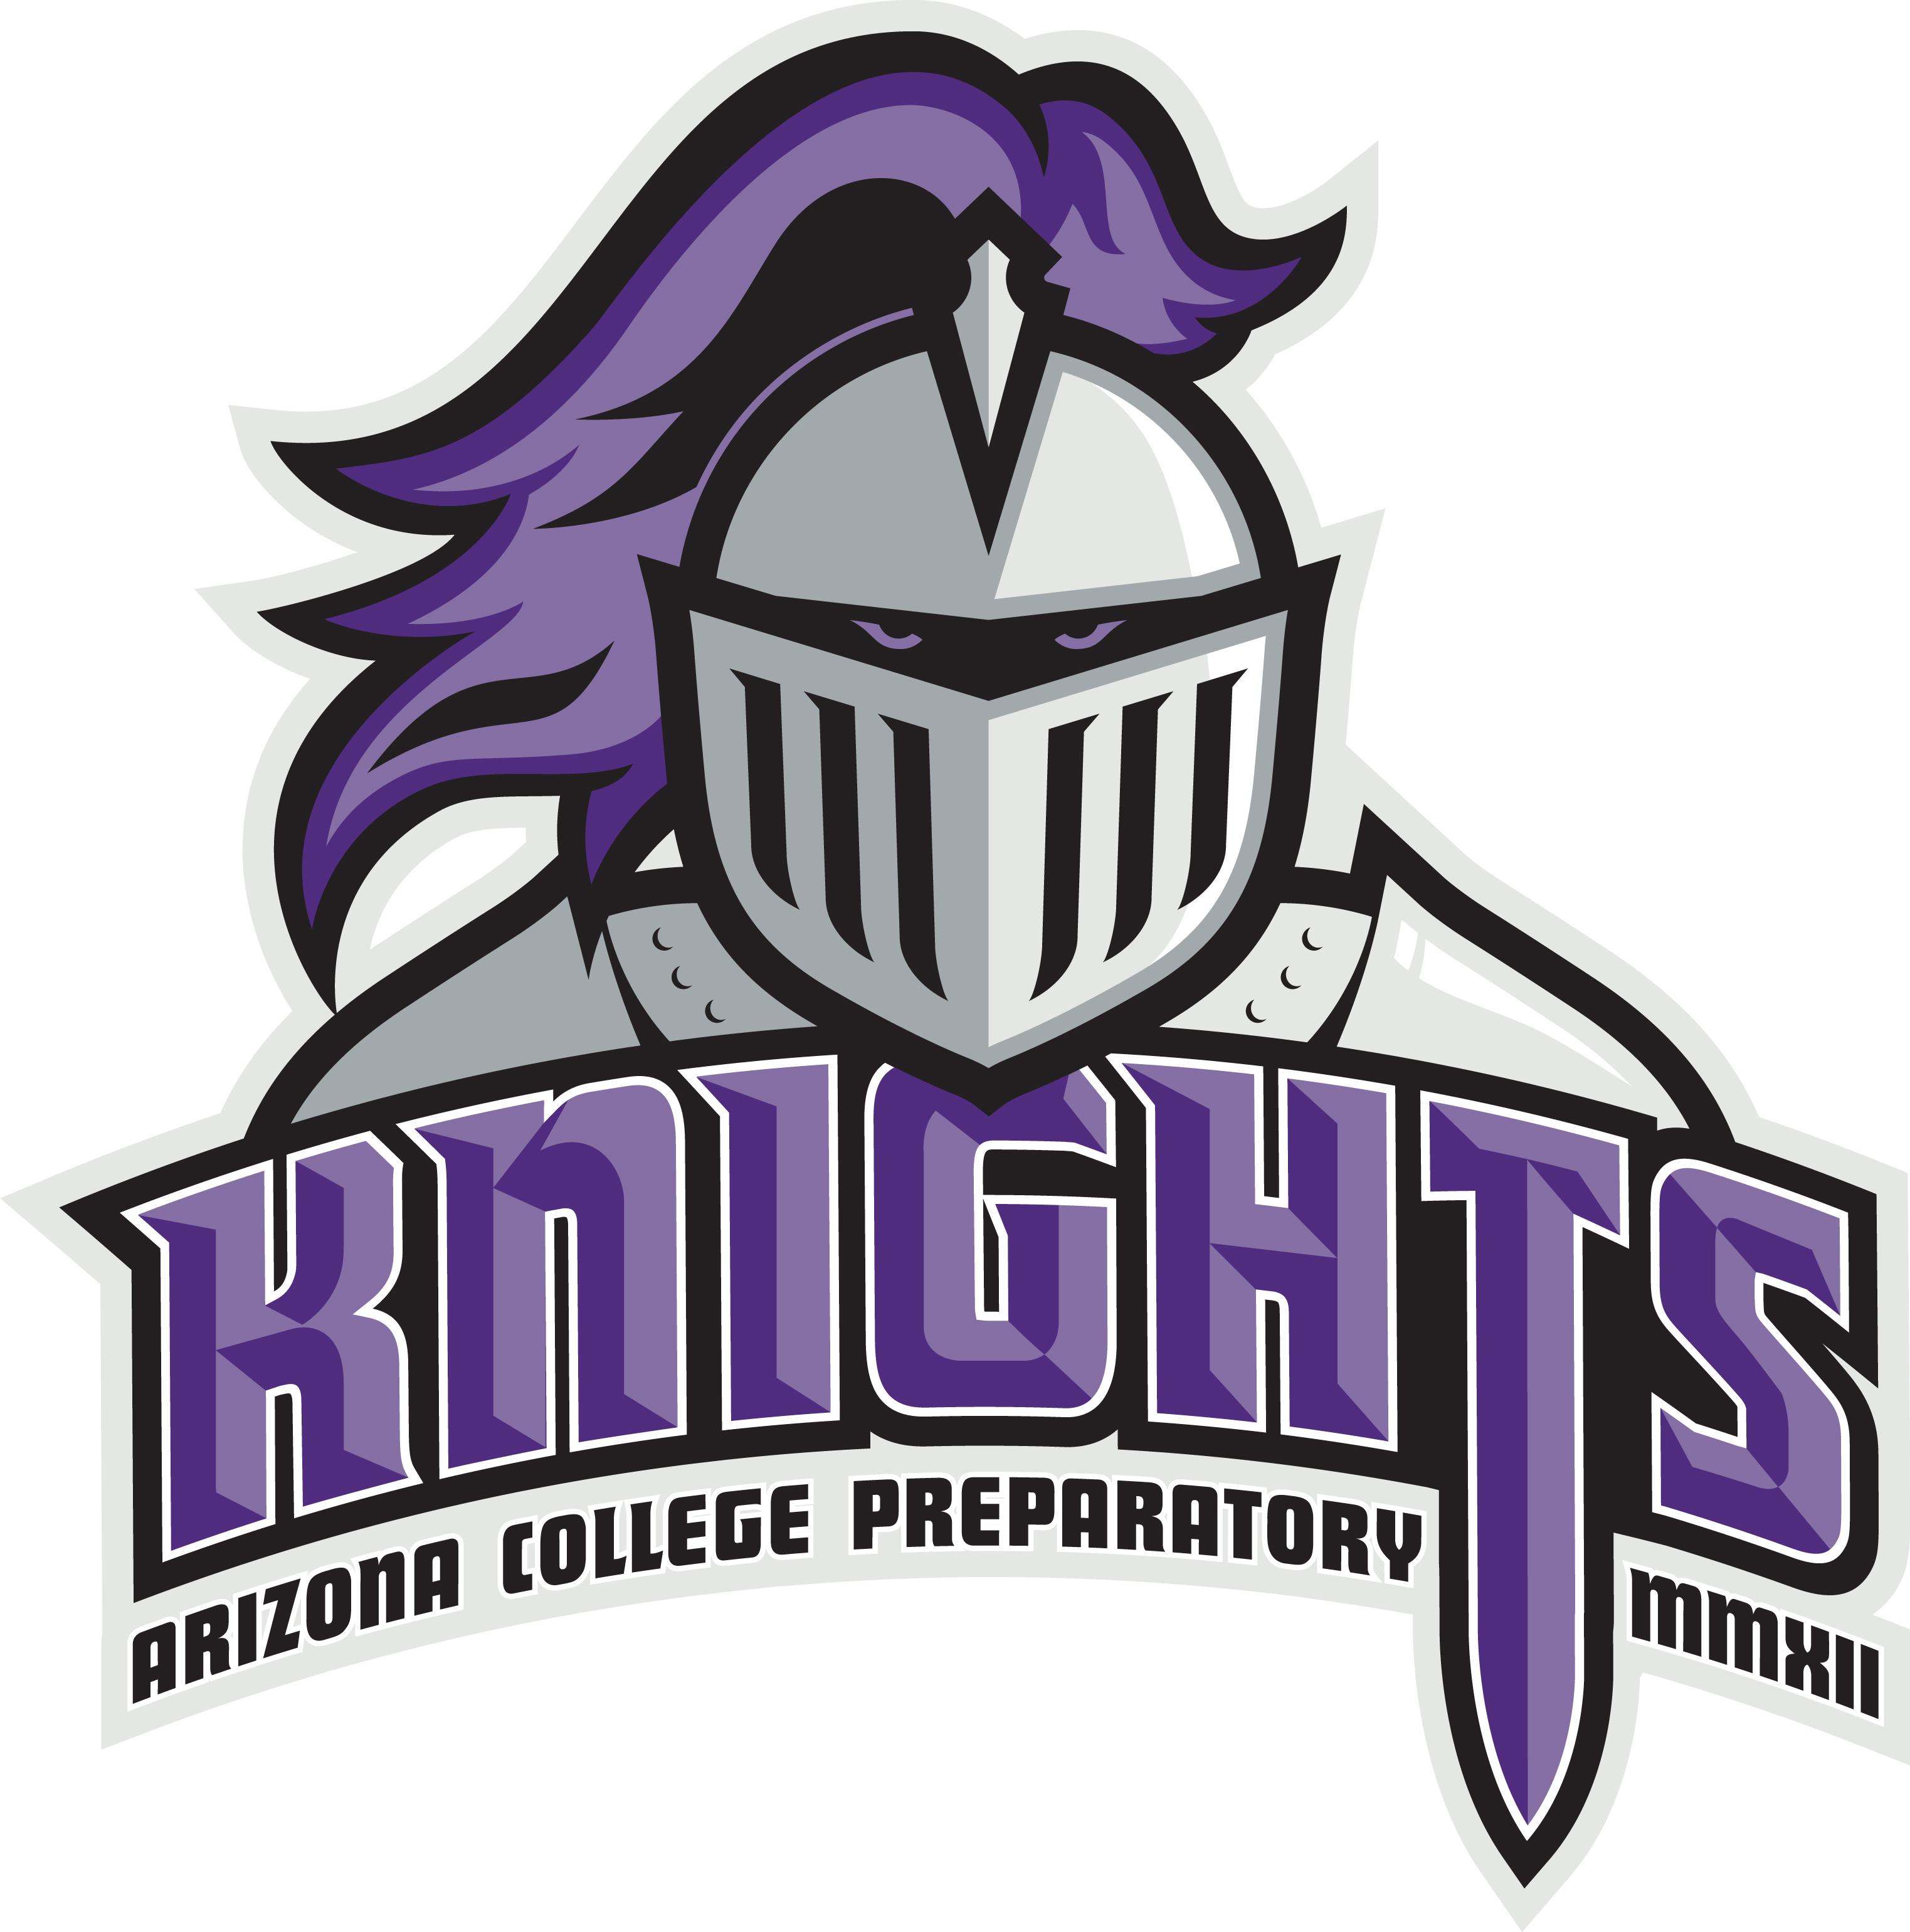 Arizona College Prep - Erie